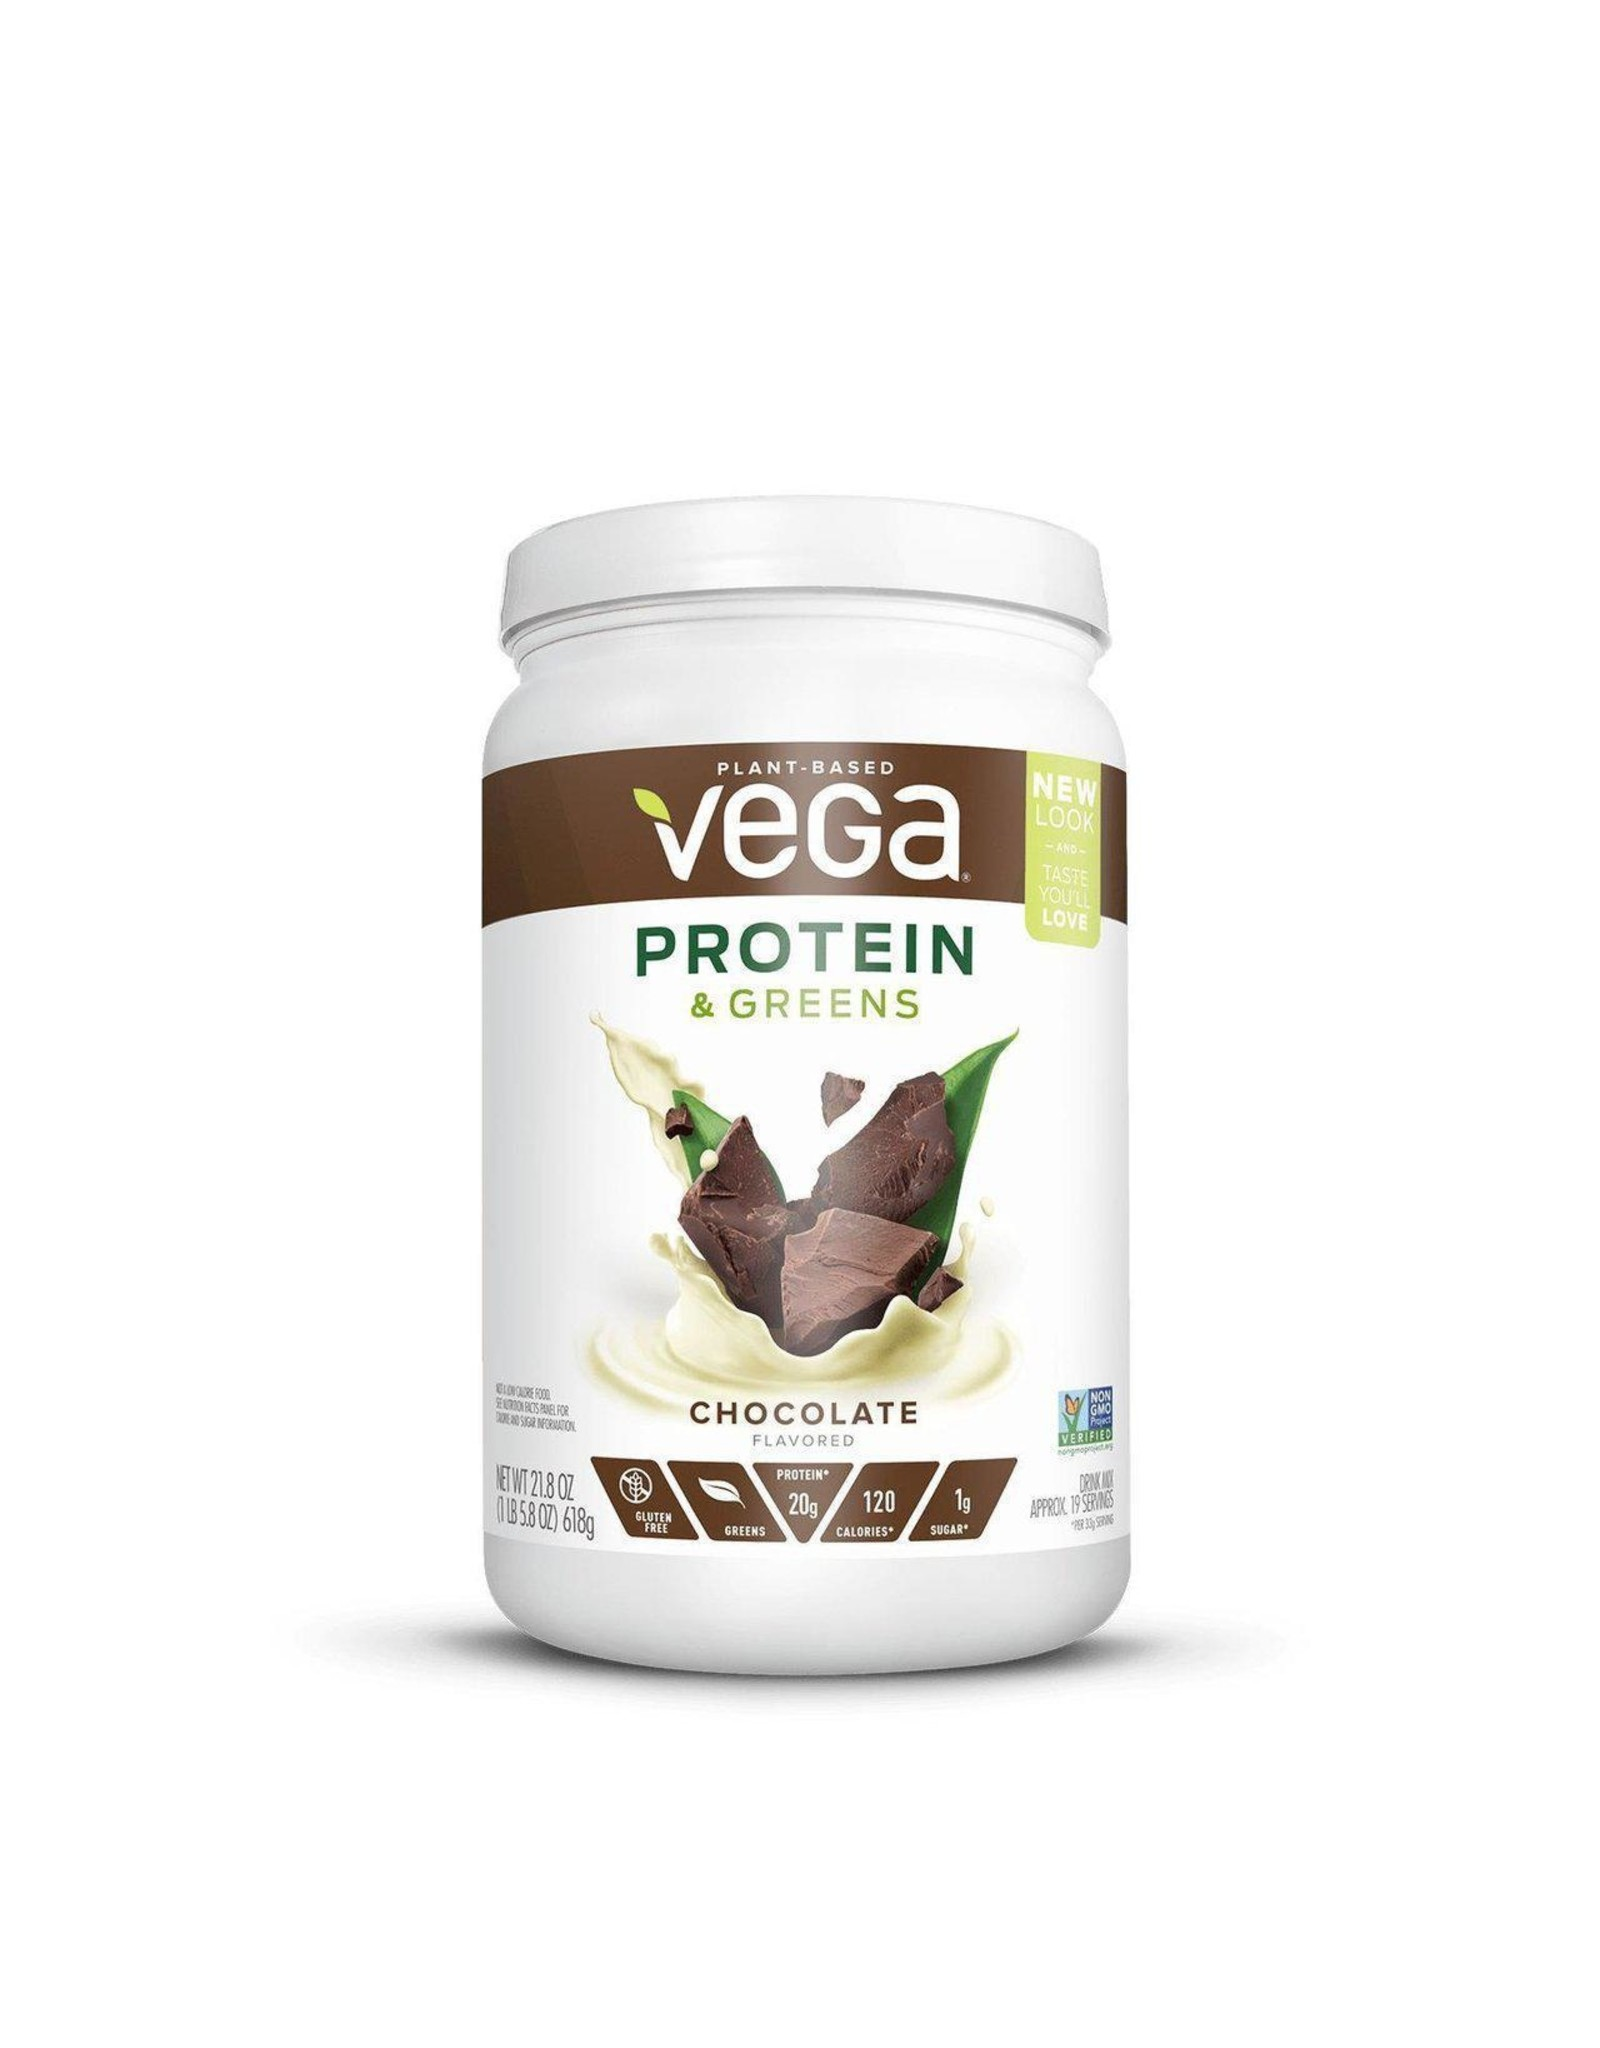 VEGA™ Protein & Greens